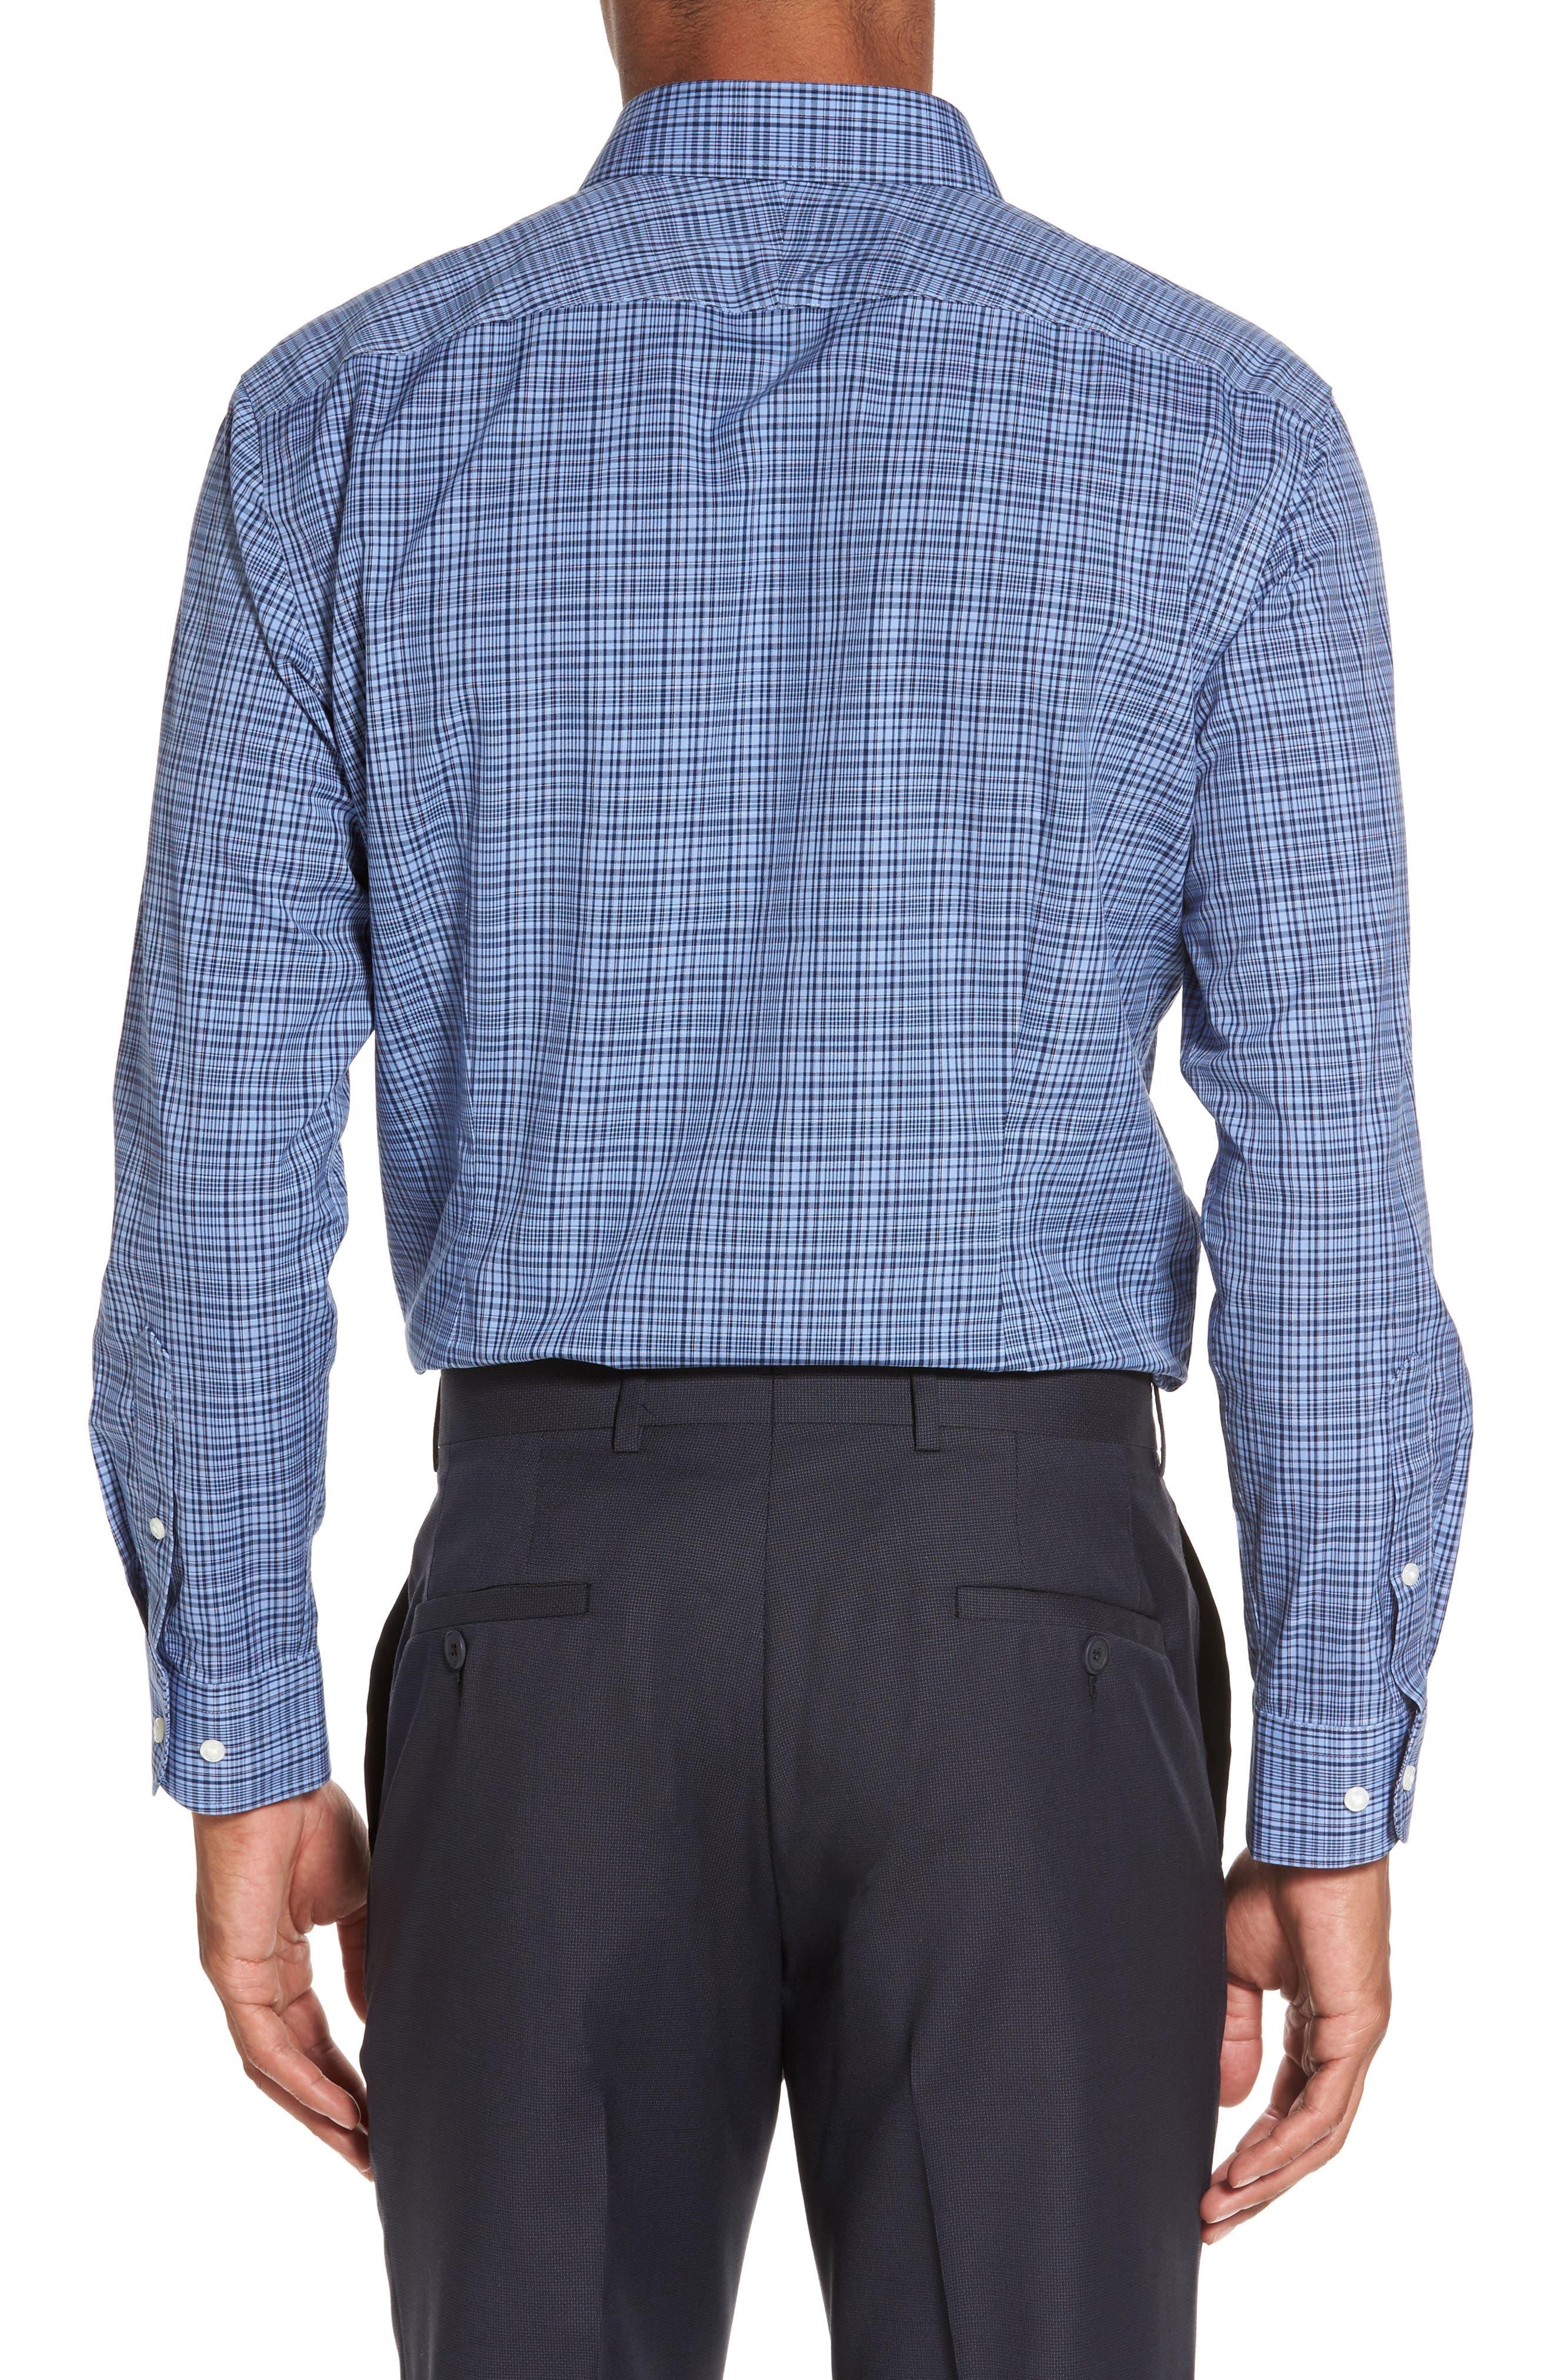 Alternate Image 3  - Nordstrom Men's Shop Smartcare™ Extra Trim Fit Check Dress Shirt